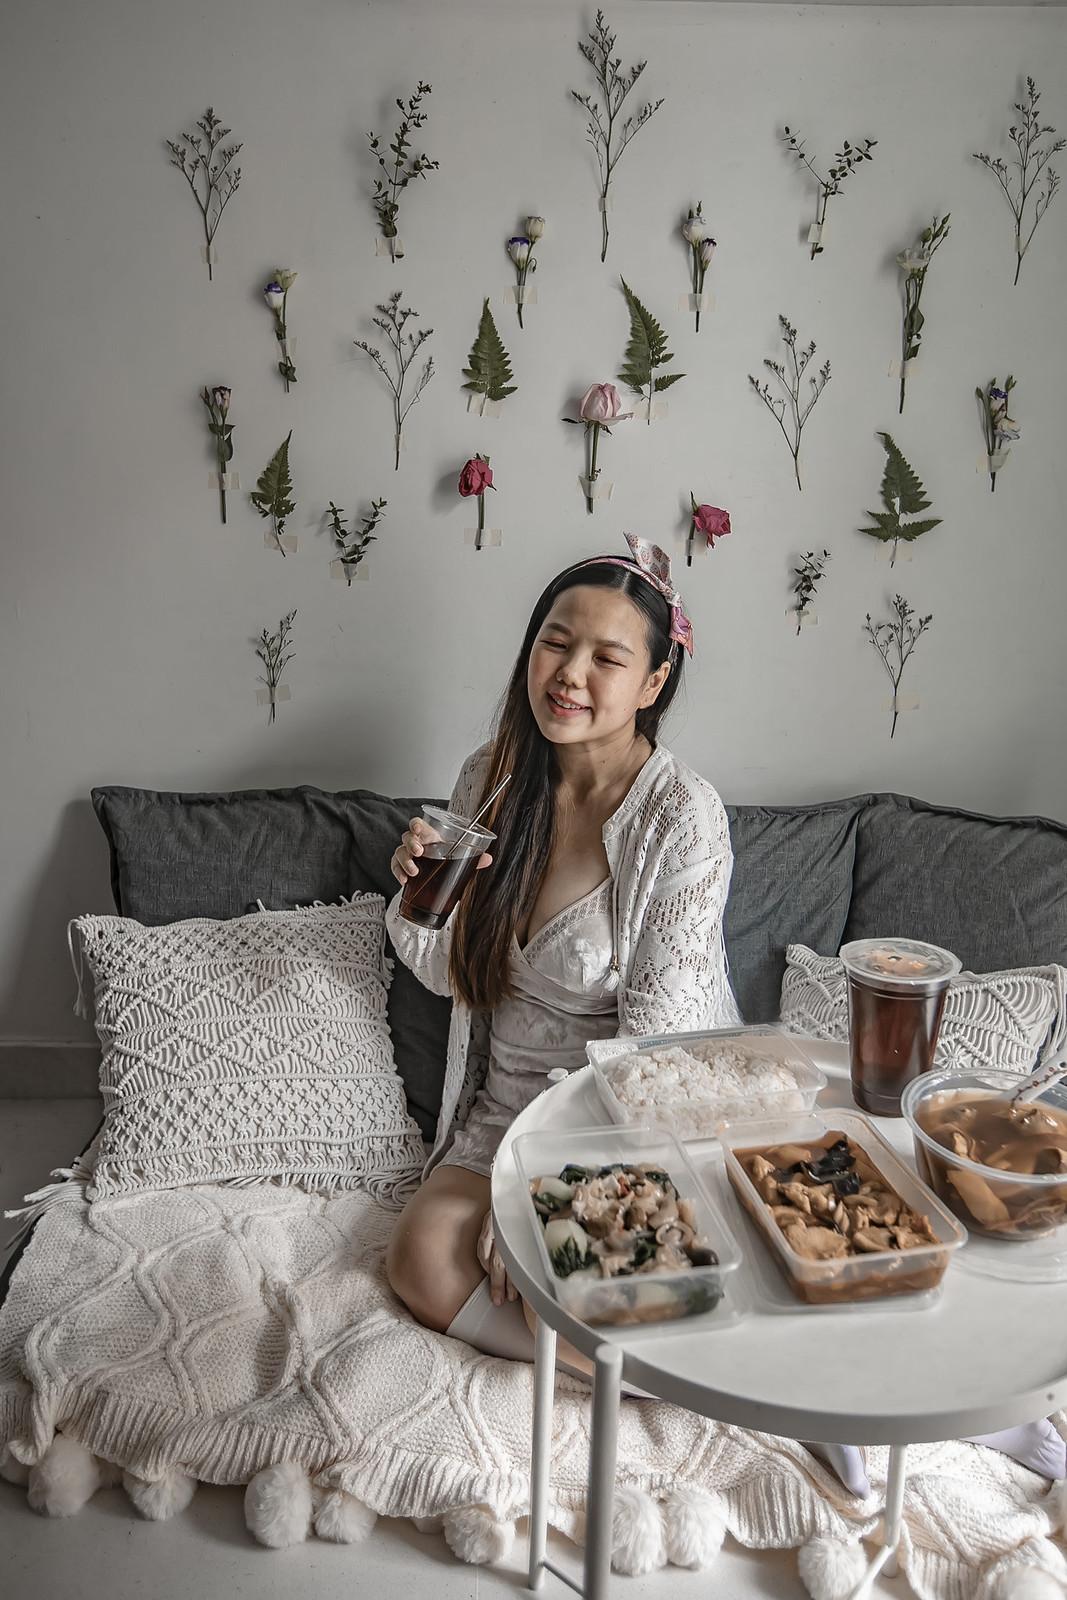 confinement food singapore review